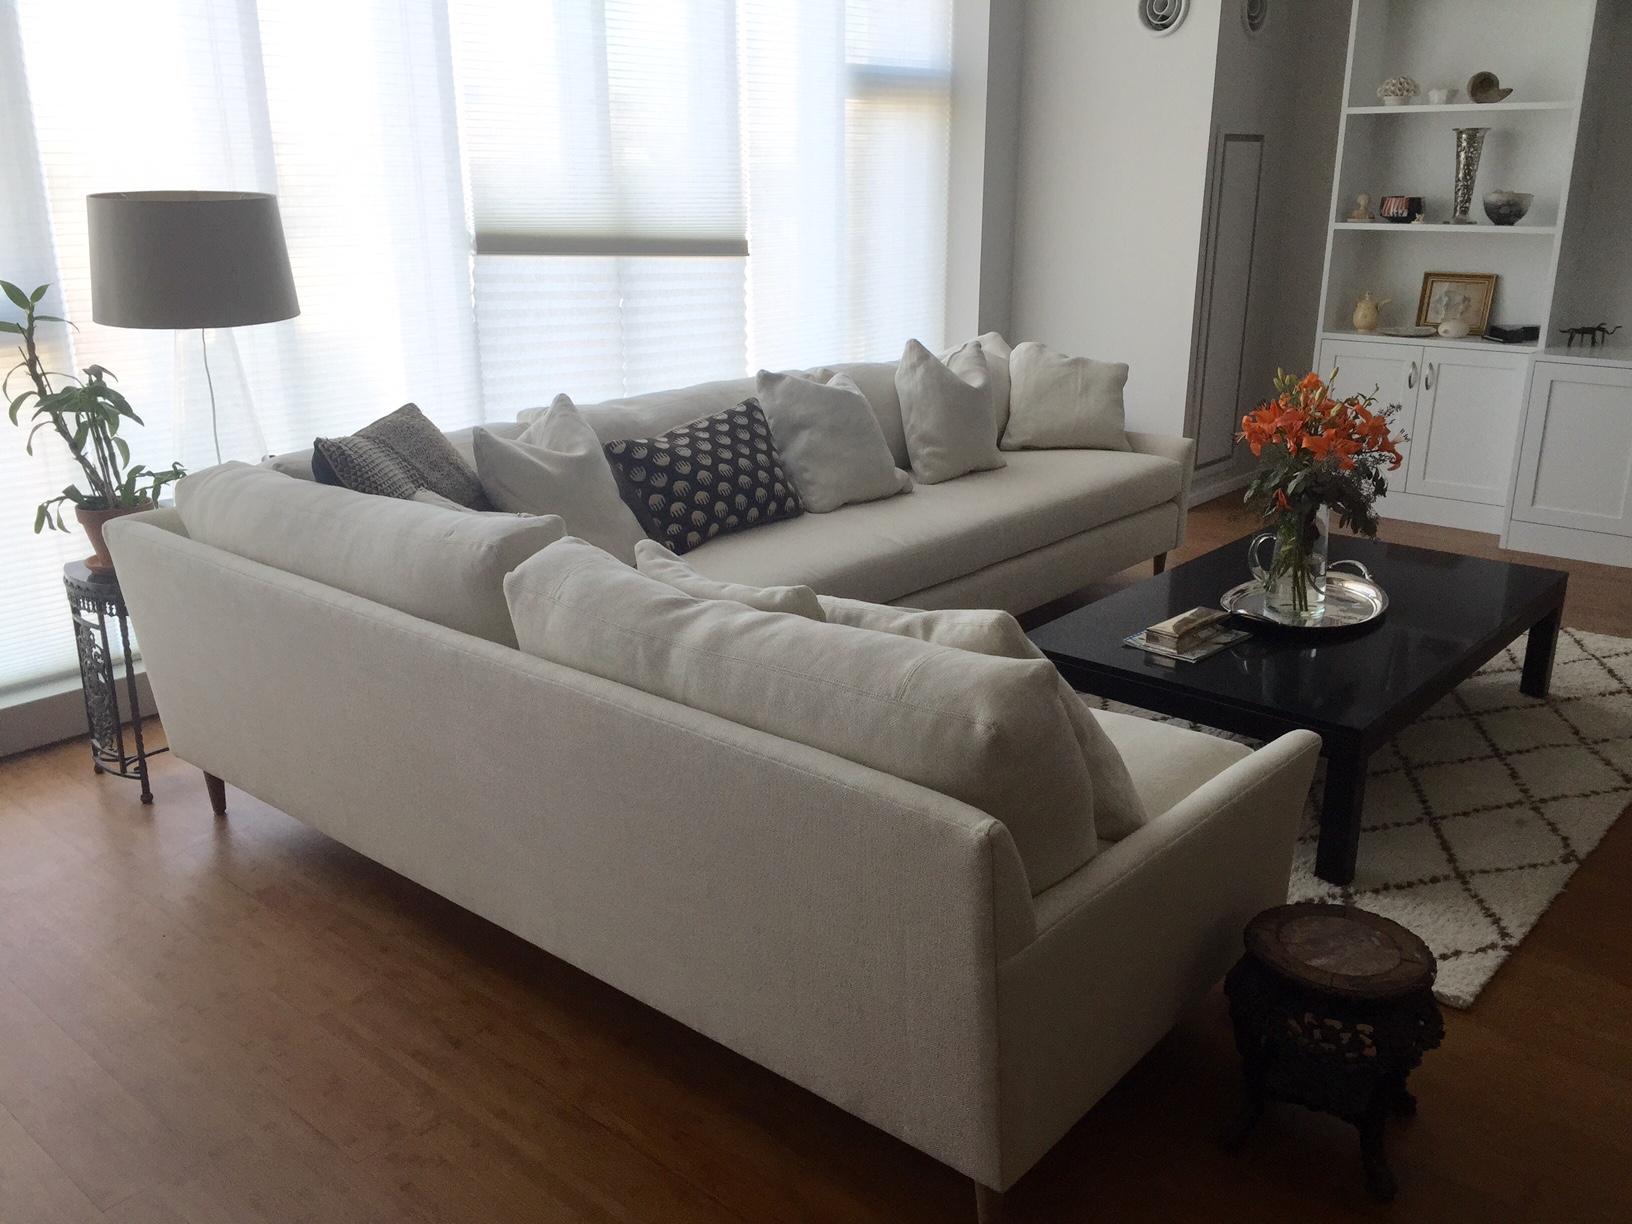 sectional sofas boston cream leather corner sofa blanche verellen fb uph no tuft lr artefact